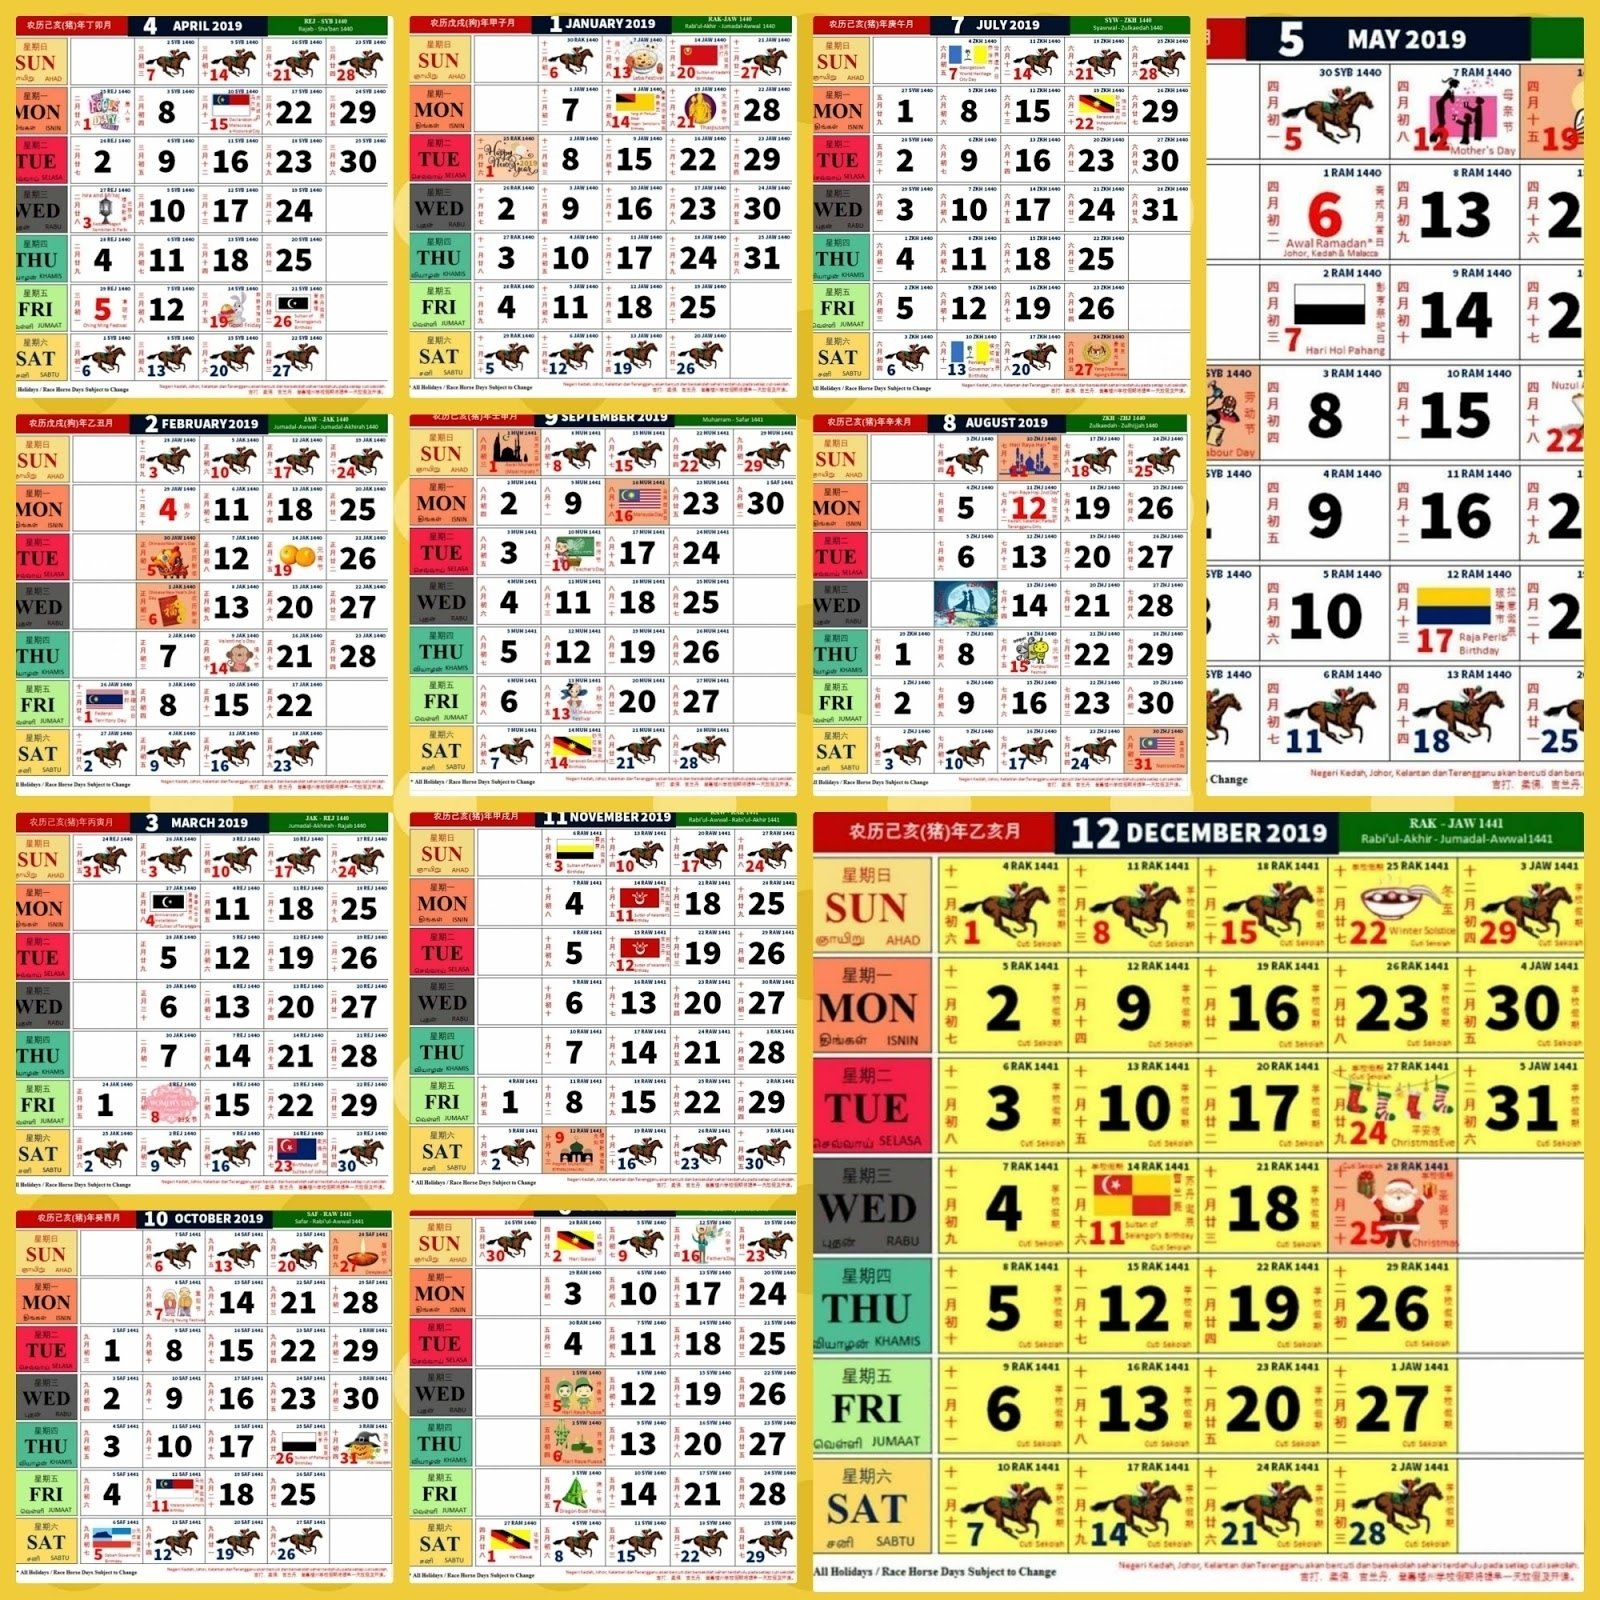 12 Month Calendar Kuda 2019 • Printable Blank Calendar Template Calendar 2019 Kuda